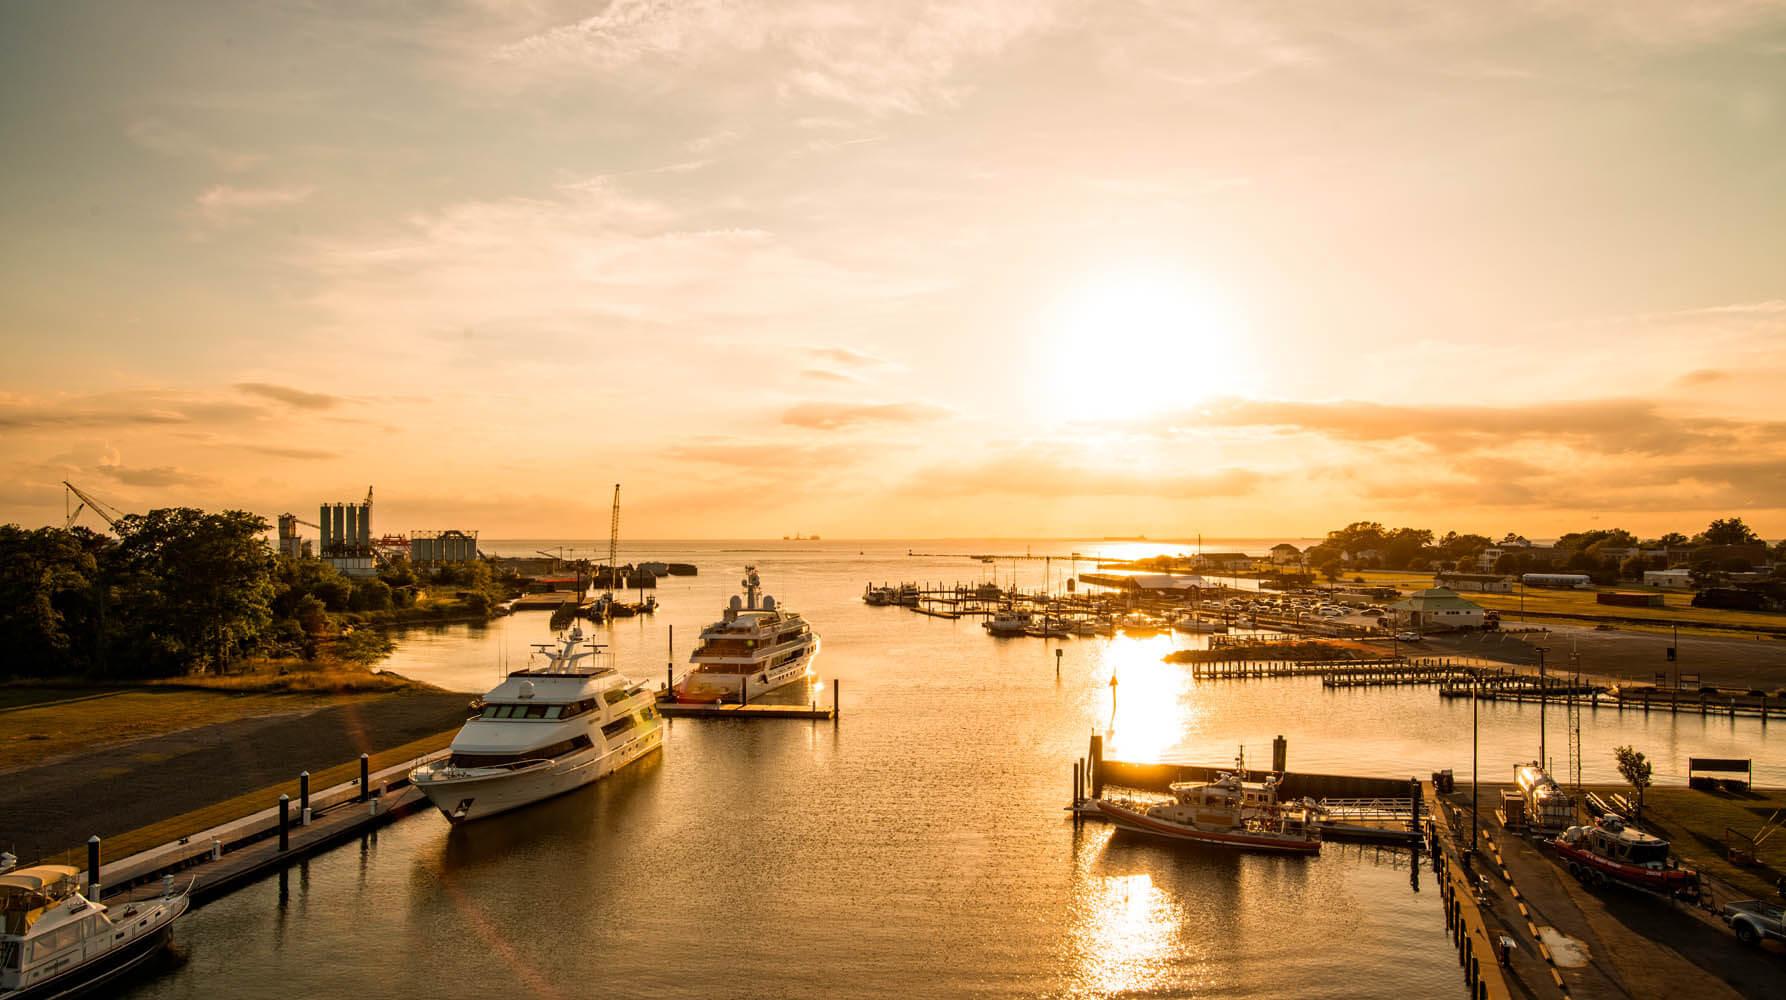 Beautiful sunset on the harbor